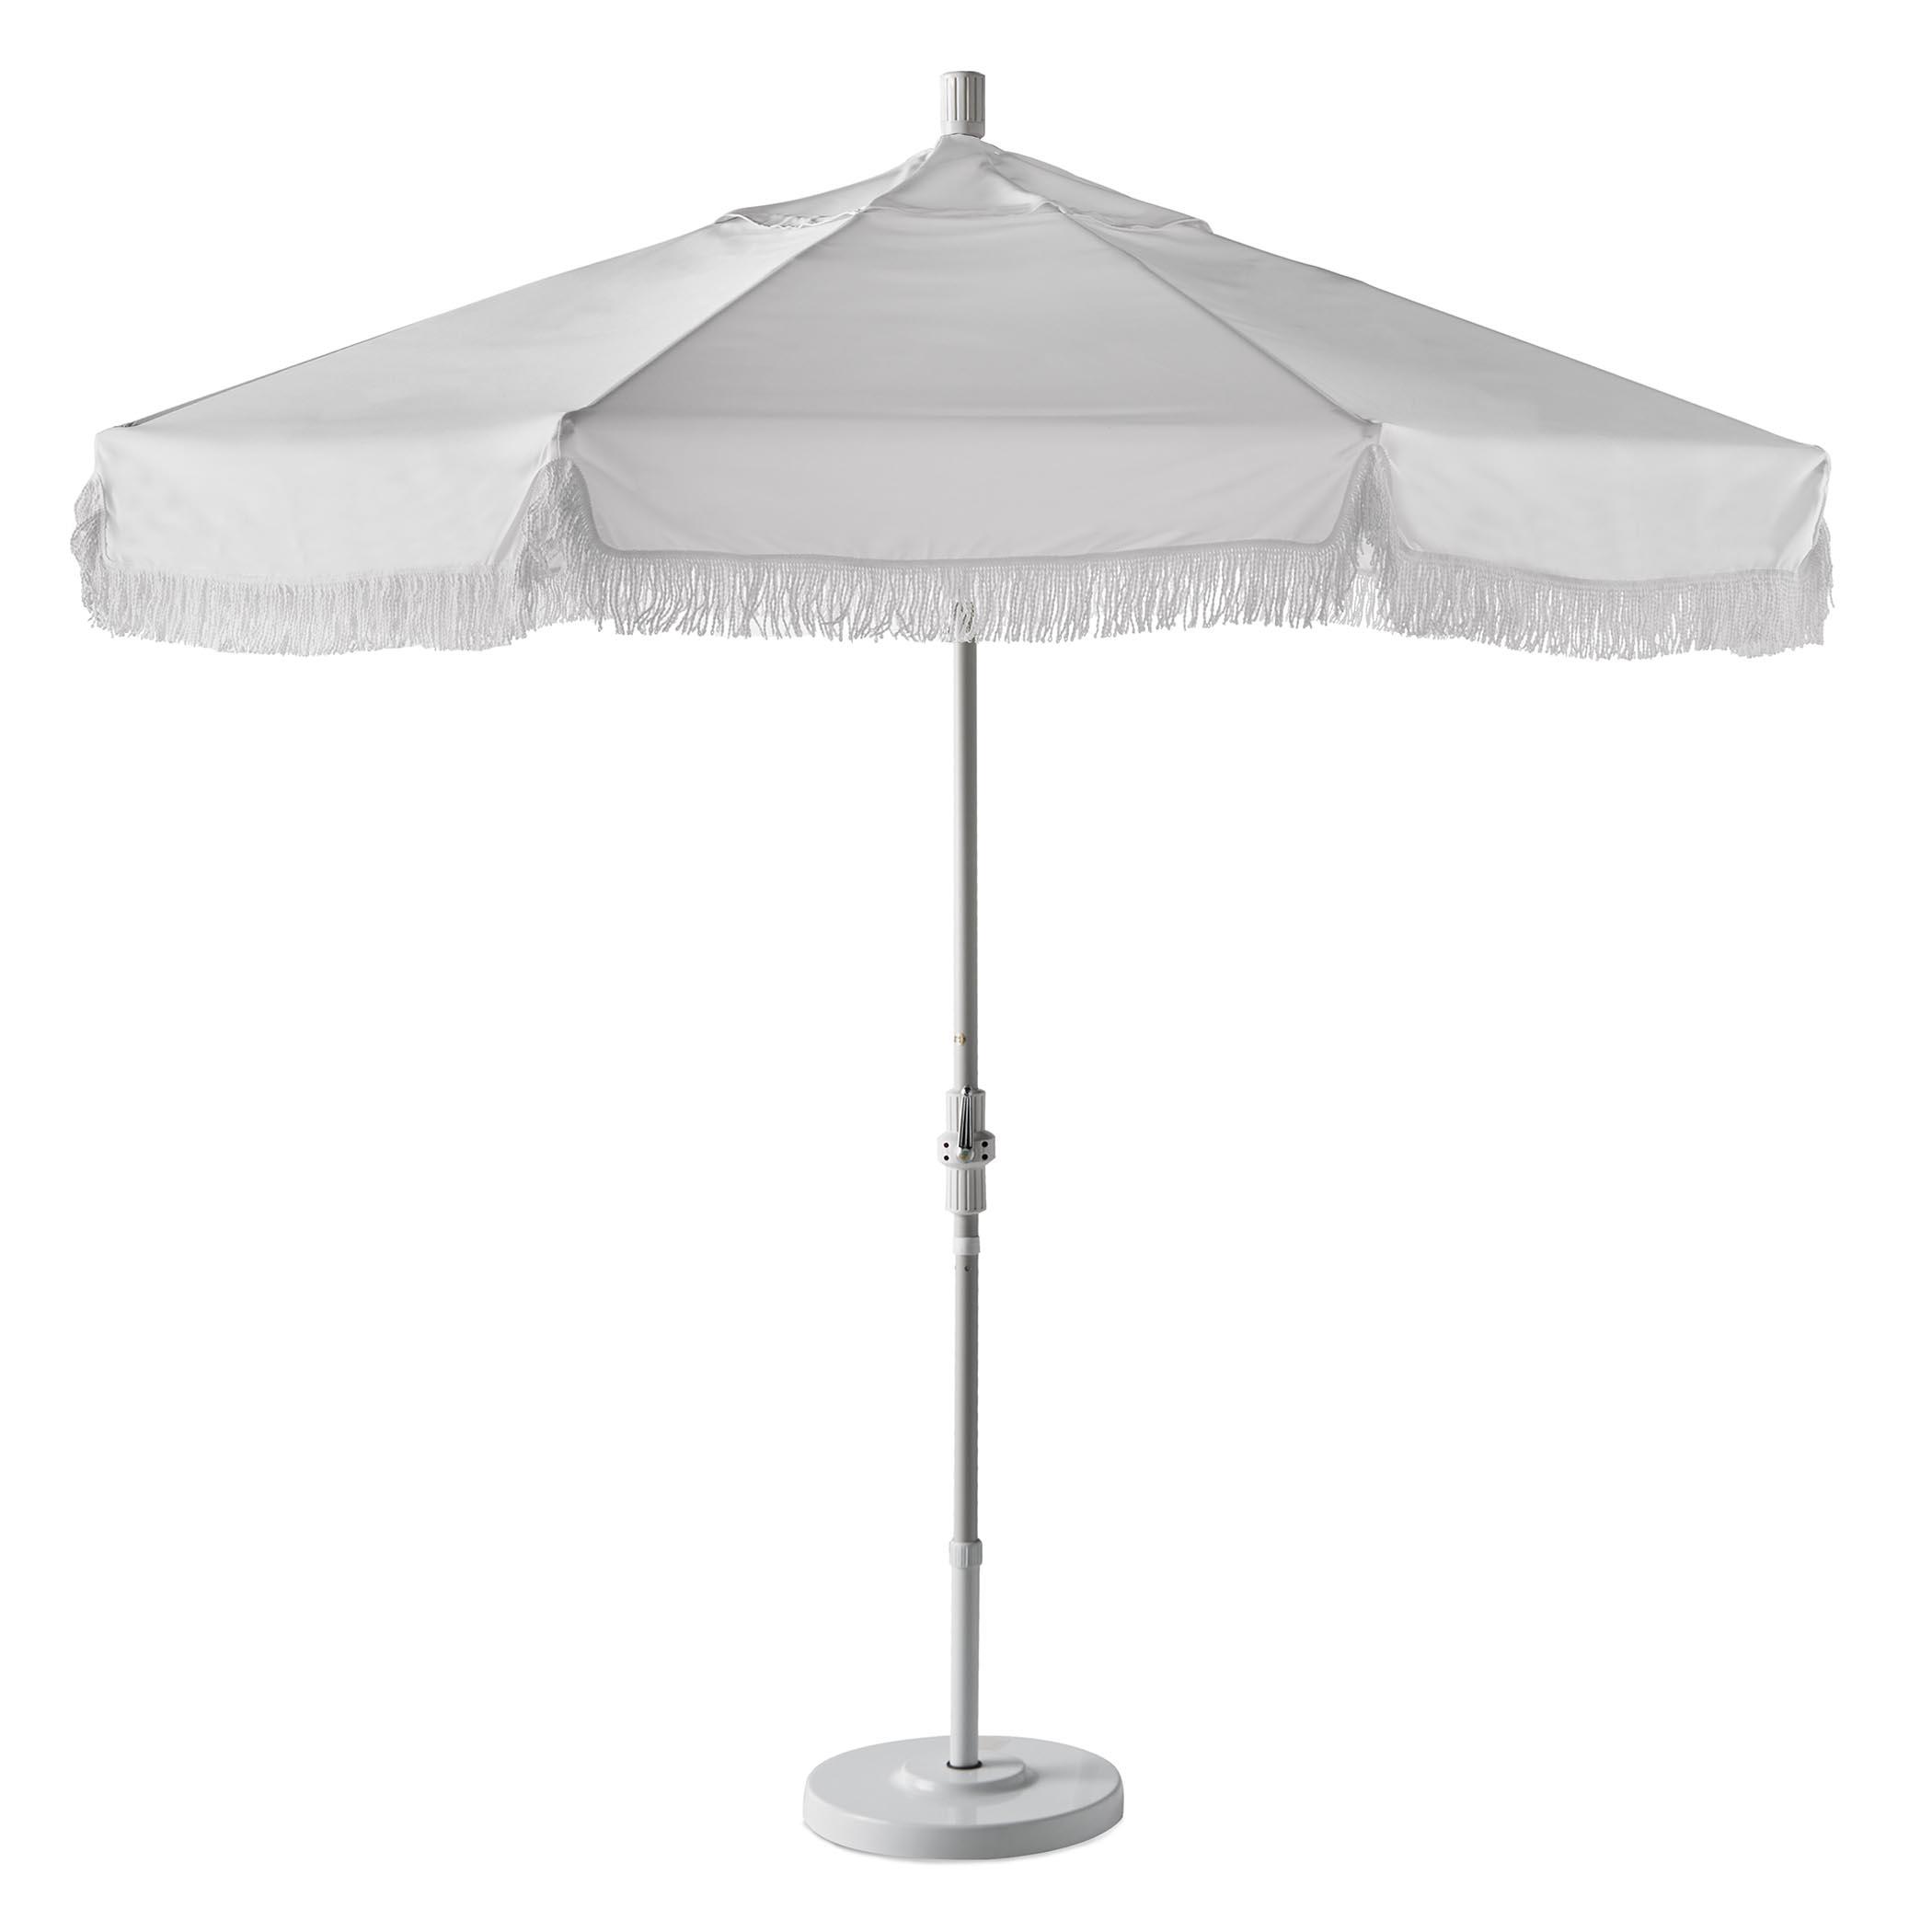 Valance Umbrella 9'